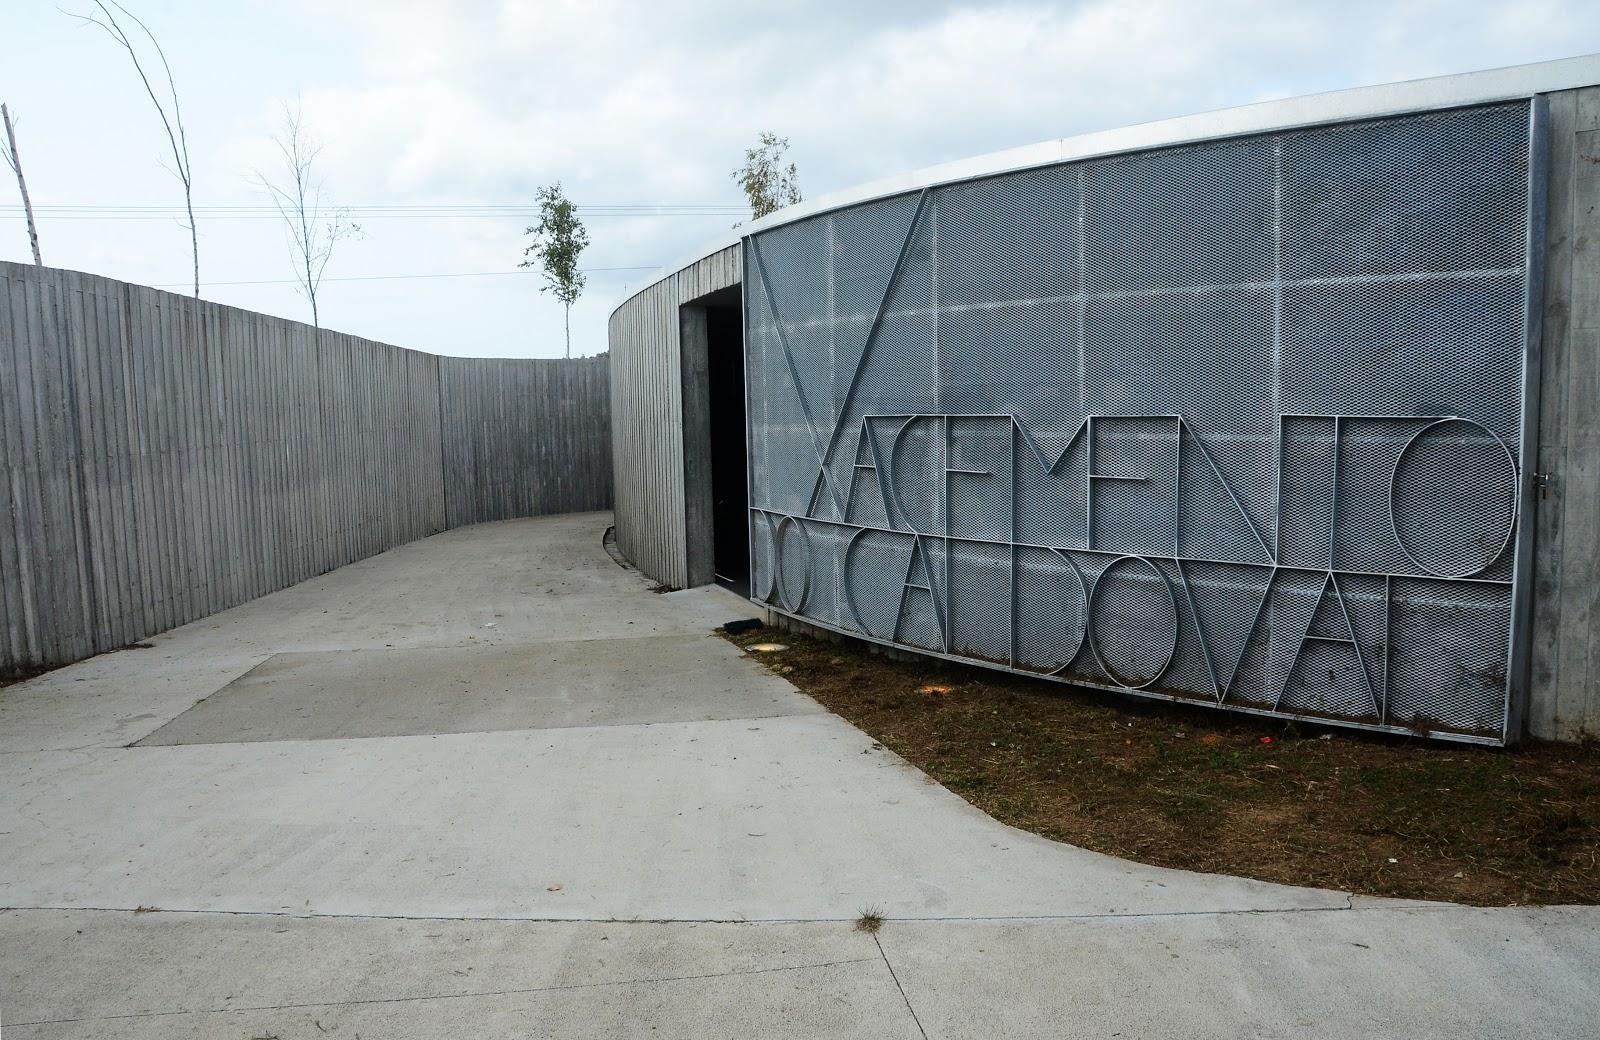 Centro de Interpretación de Caldoval - Xacemento Romano